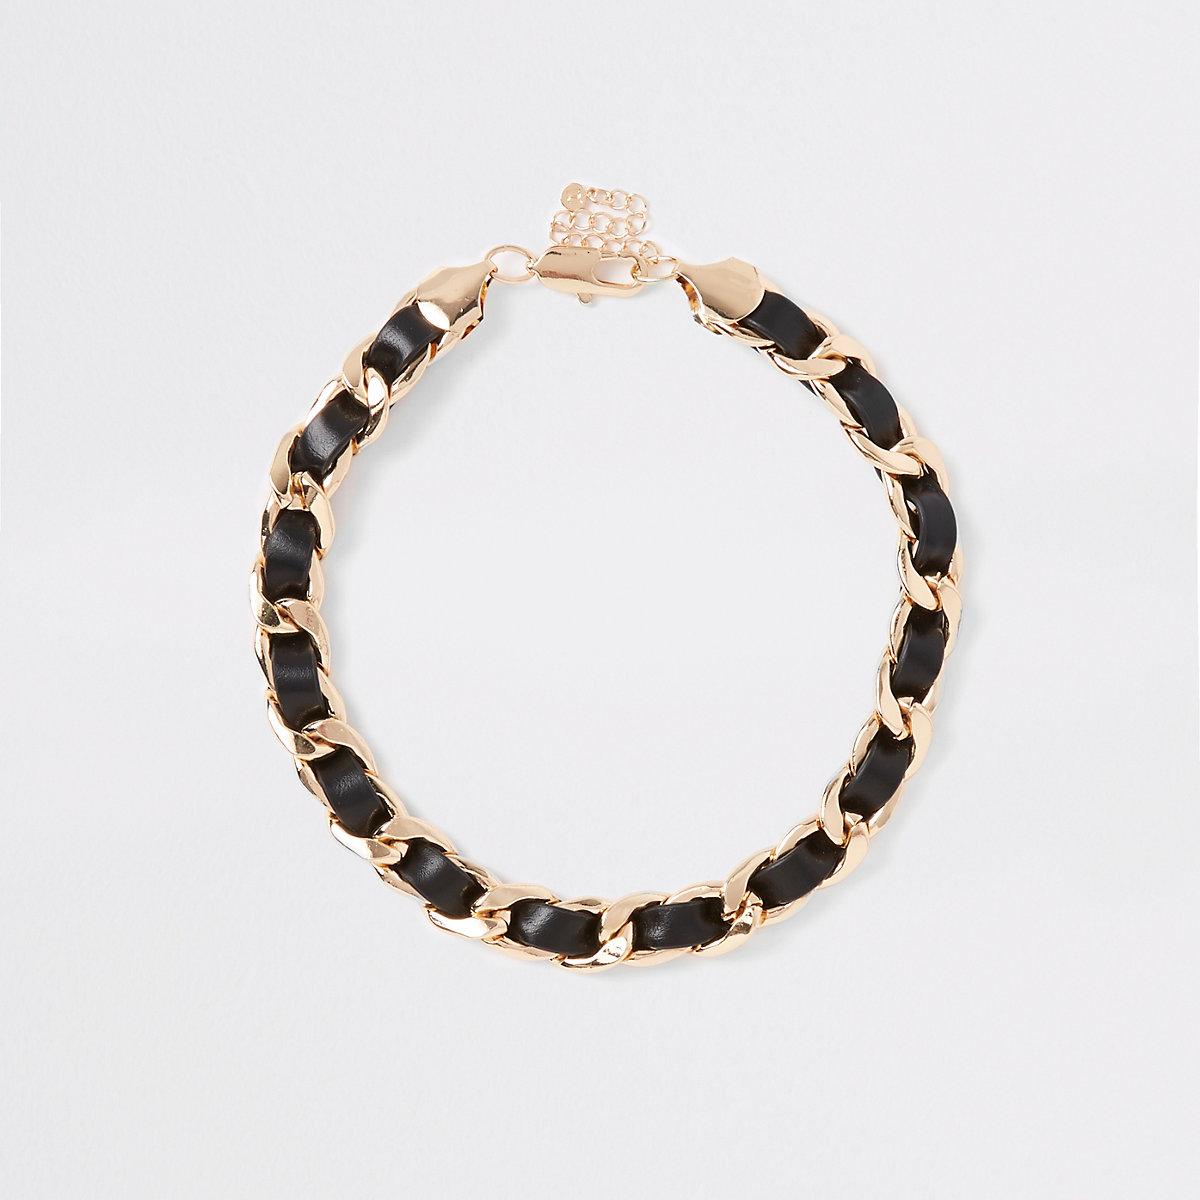 Black faux leather chain necklace